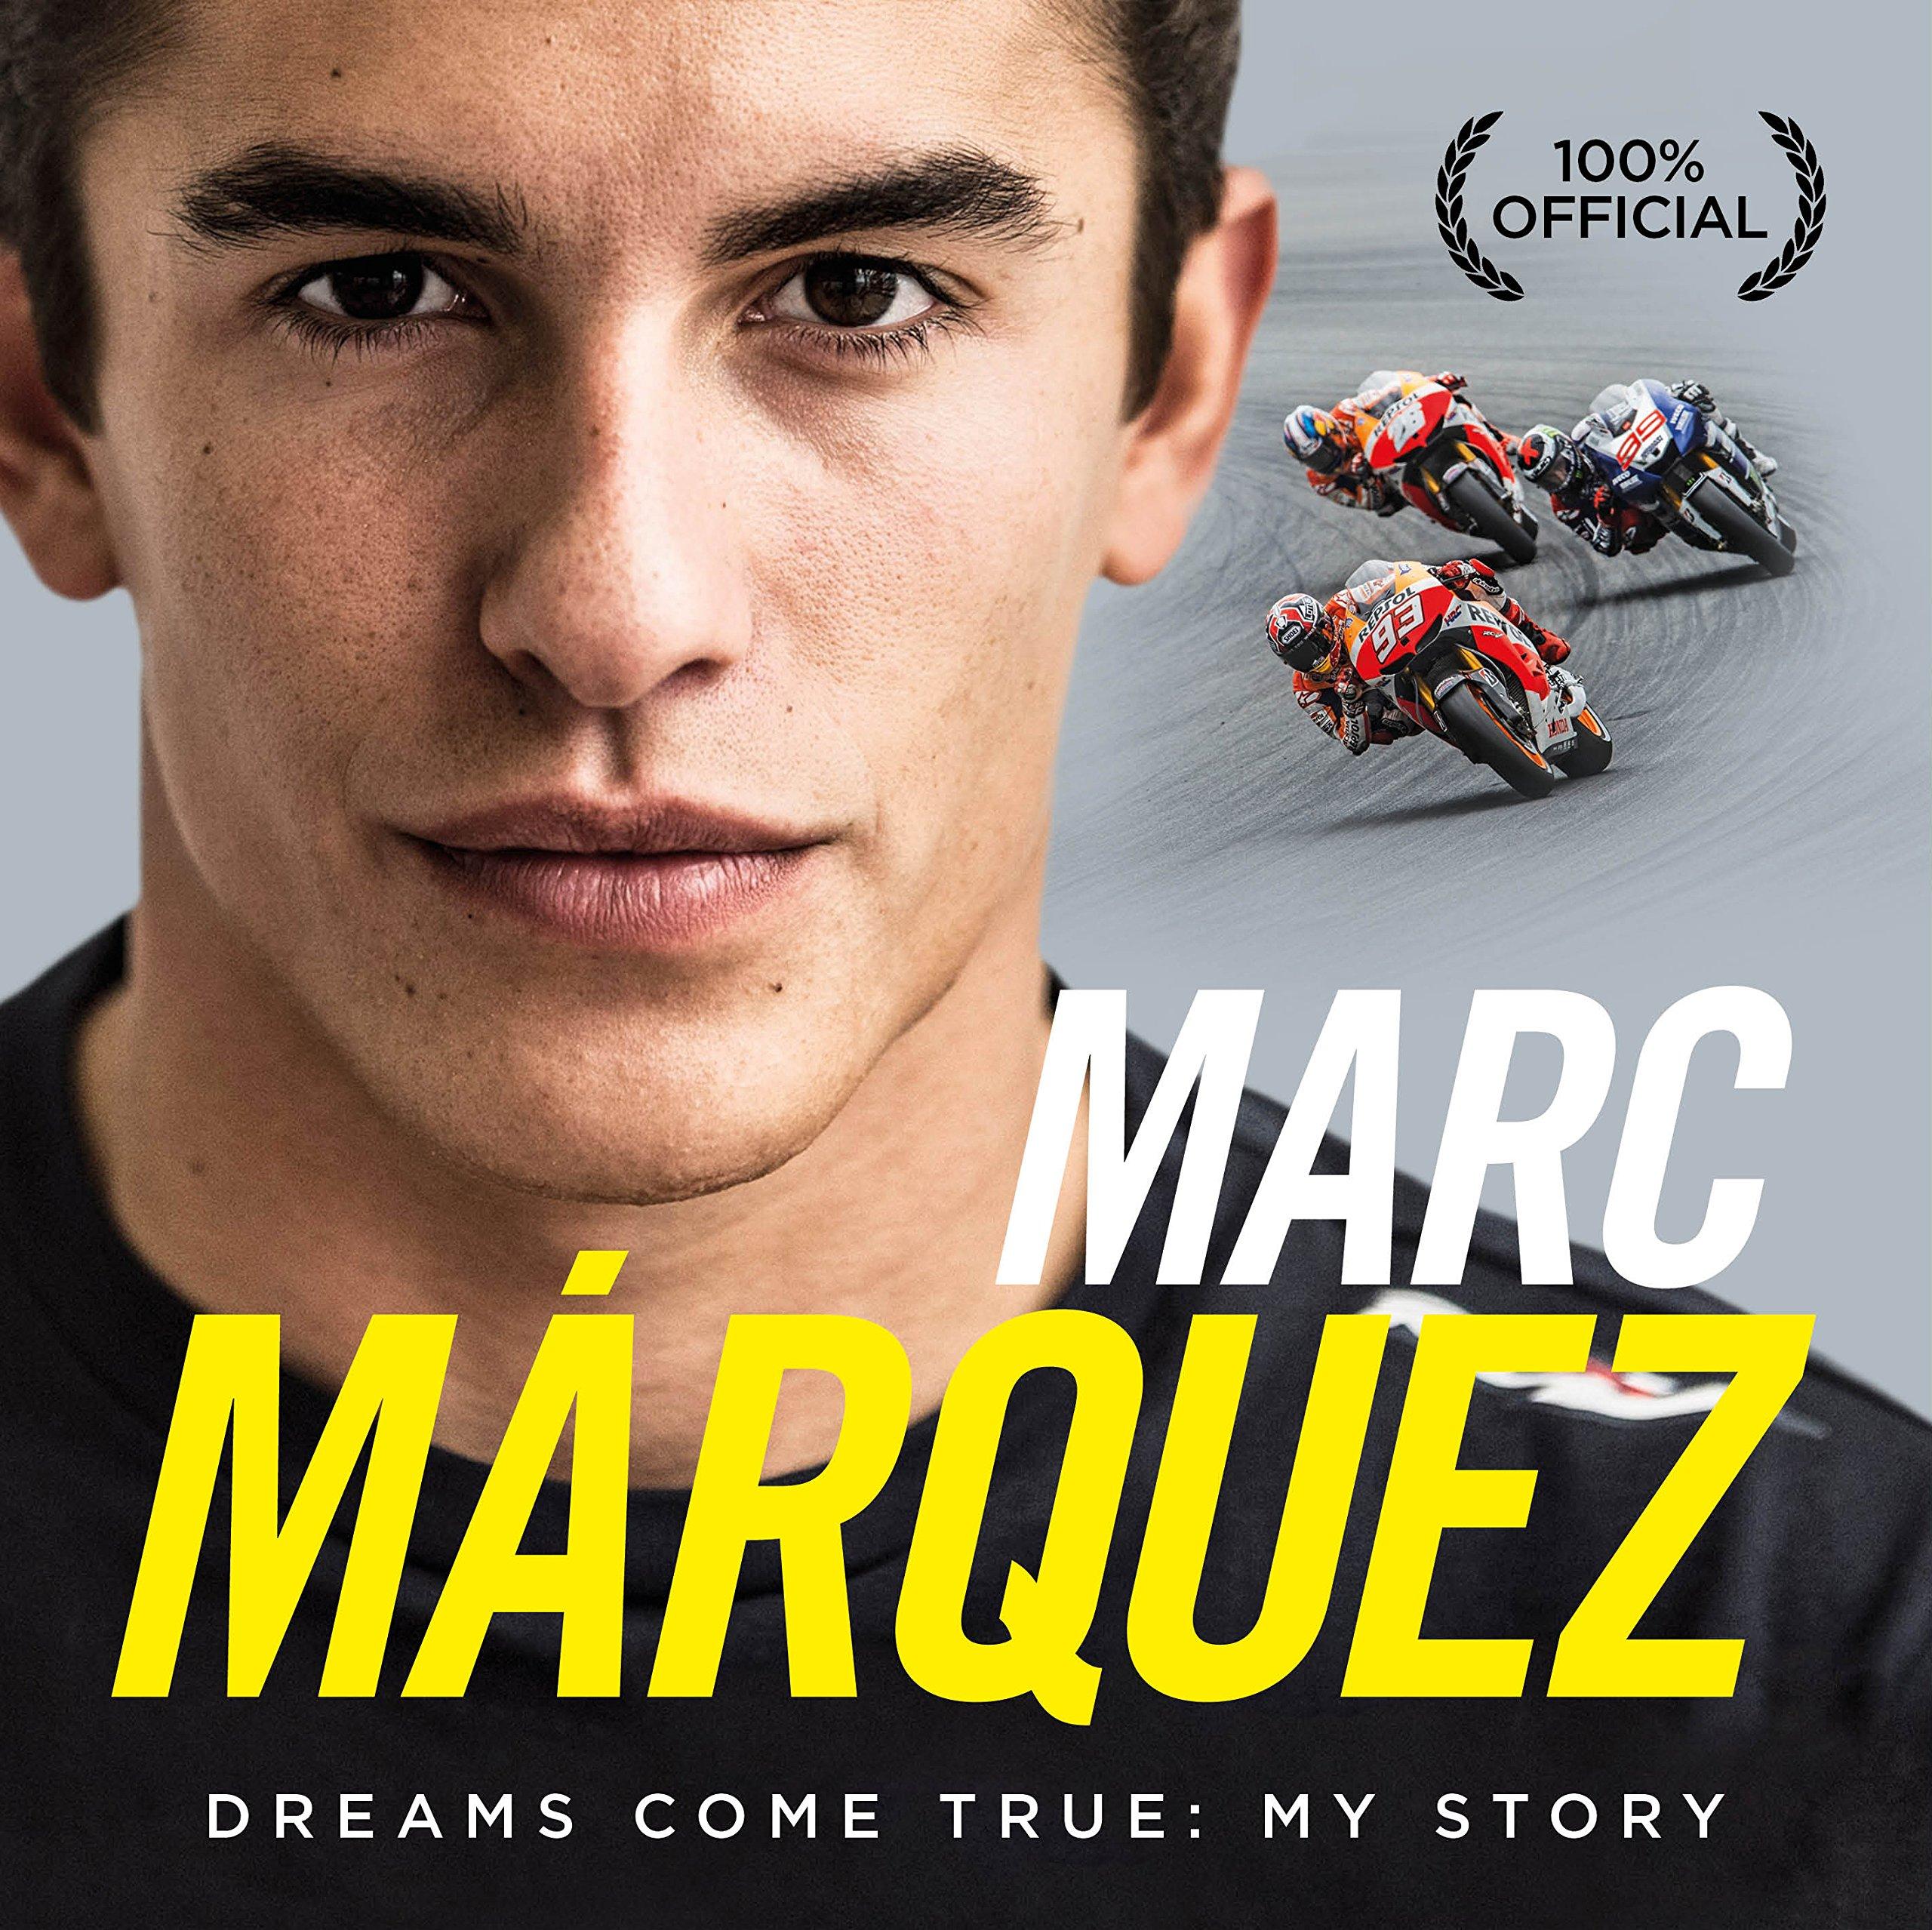 marc marquez dreams come true superbike magazine. Black Bedroom Furniture Sets. Home Design Ideas